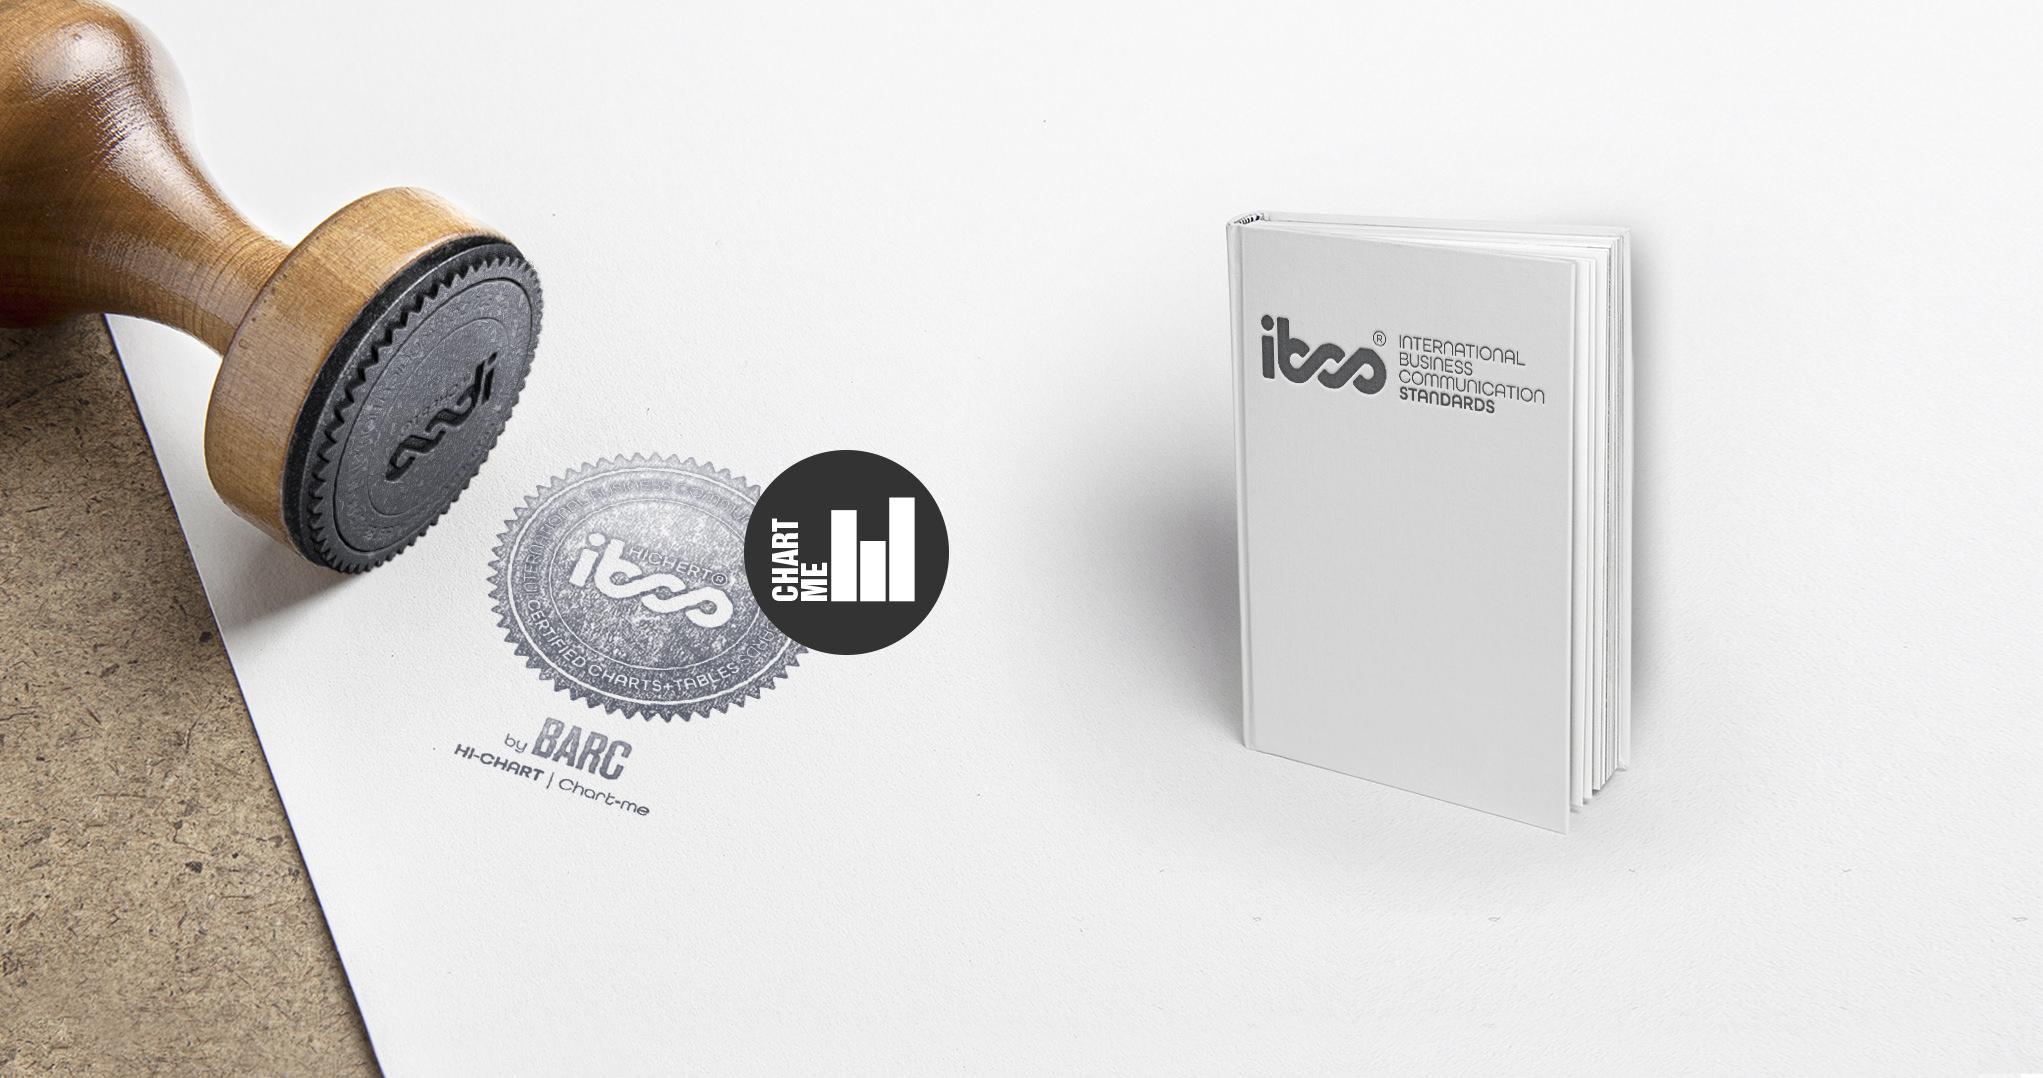 IBCS certified